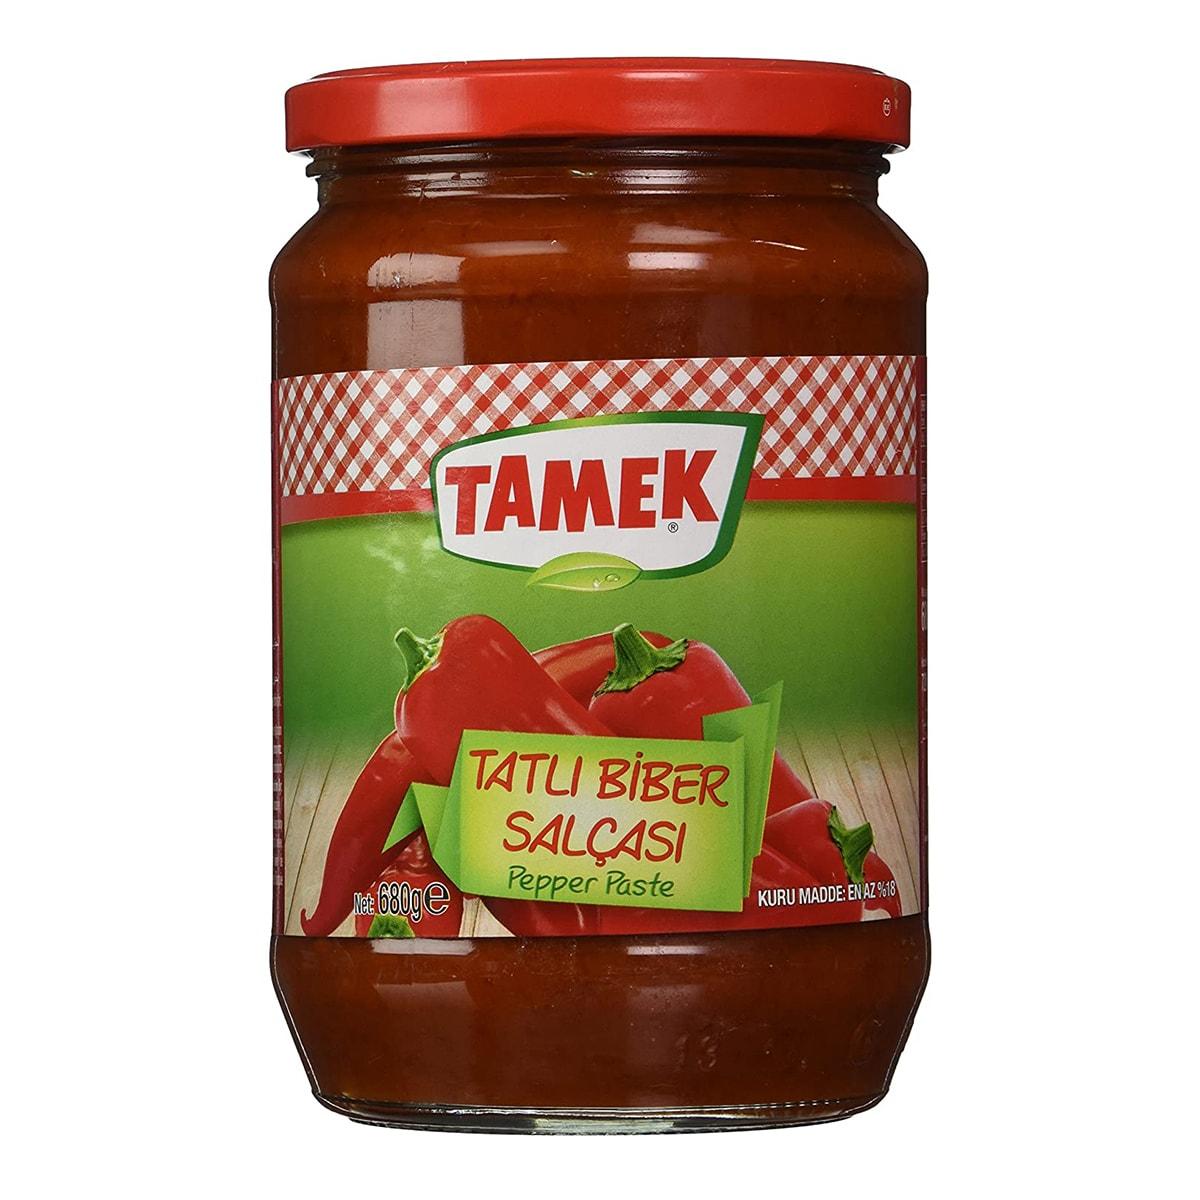 Buy Tamek Pepper Paste Hot (Tatli Biber Salcasi) - 680 gm